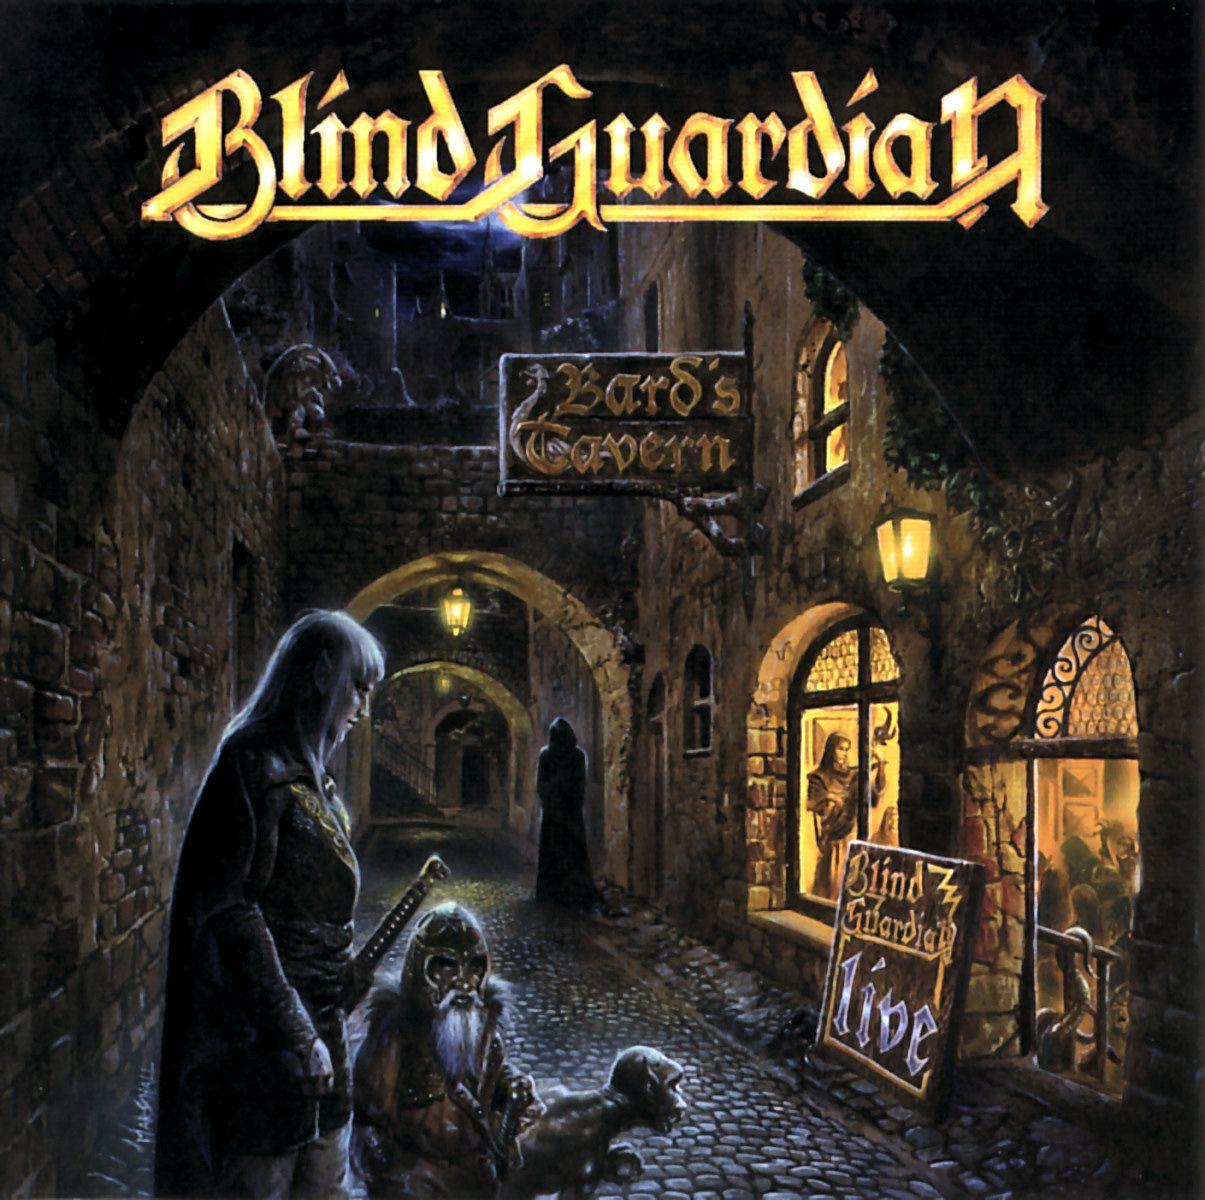 Blind Guardian - Live album cover